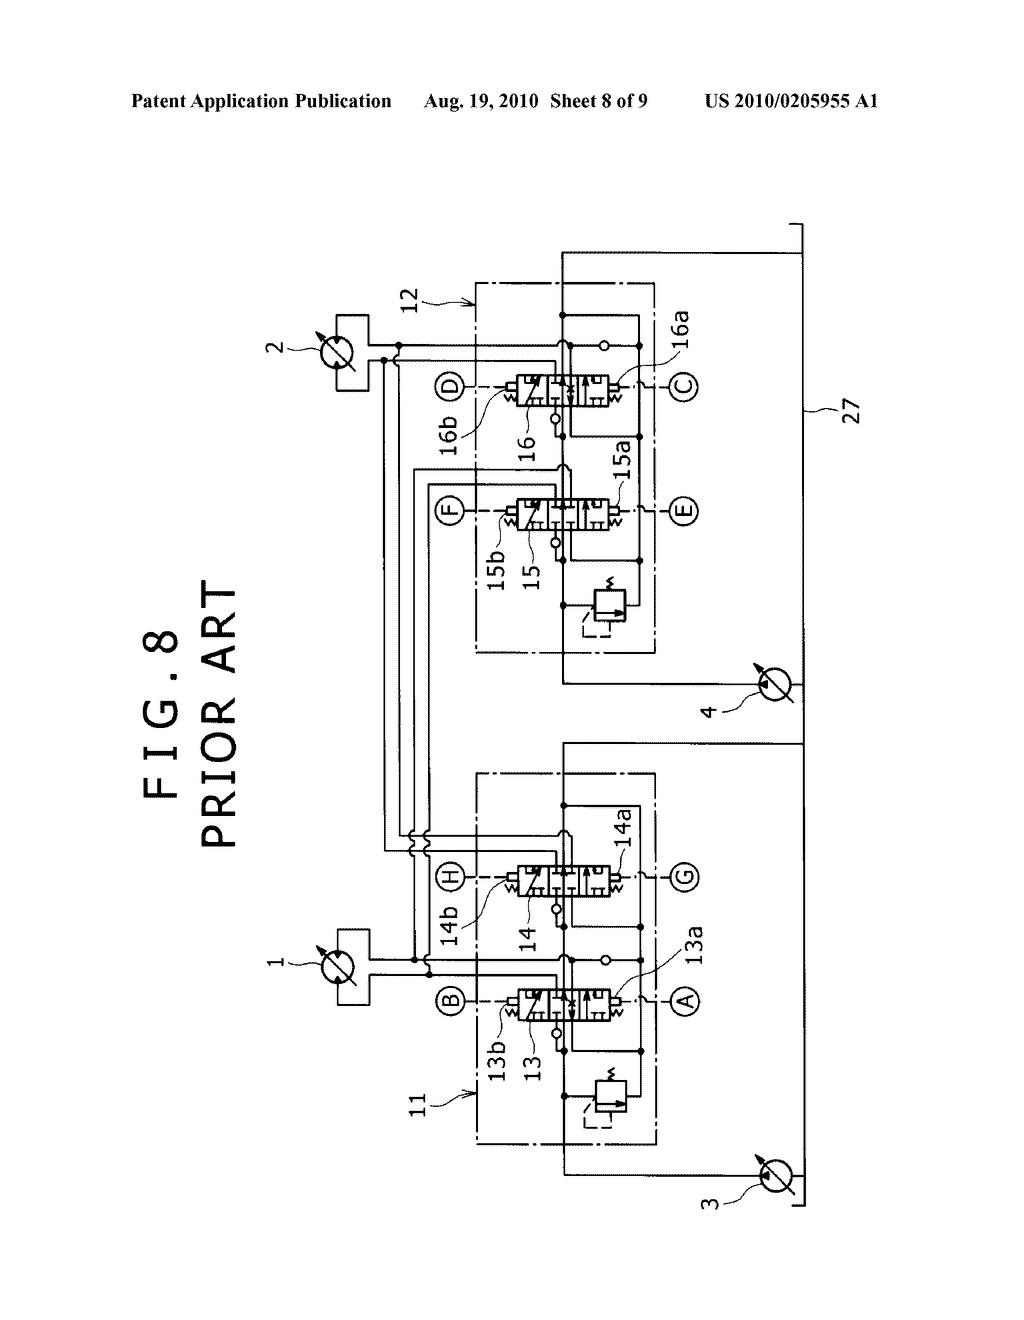 Ramsey Hydraulic Winch Diagram Trusted Wiring Diagrams Braden Enthusiast U2022 Parts